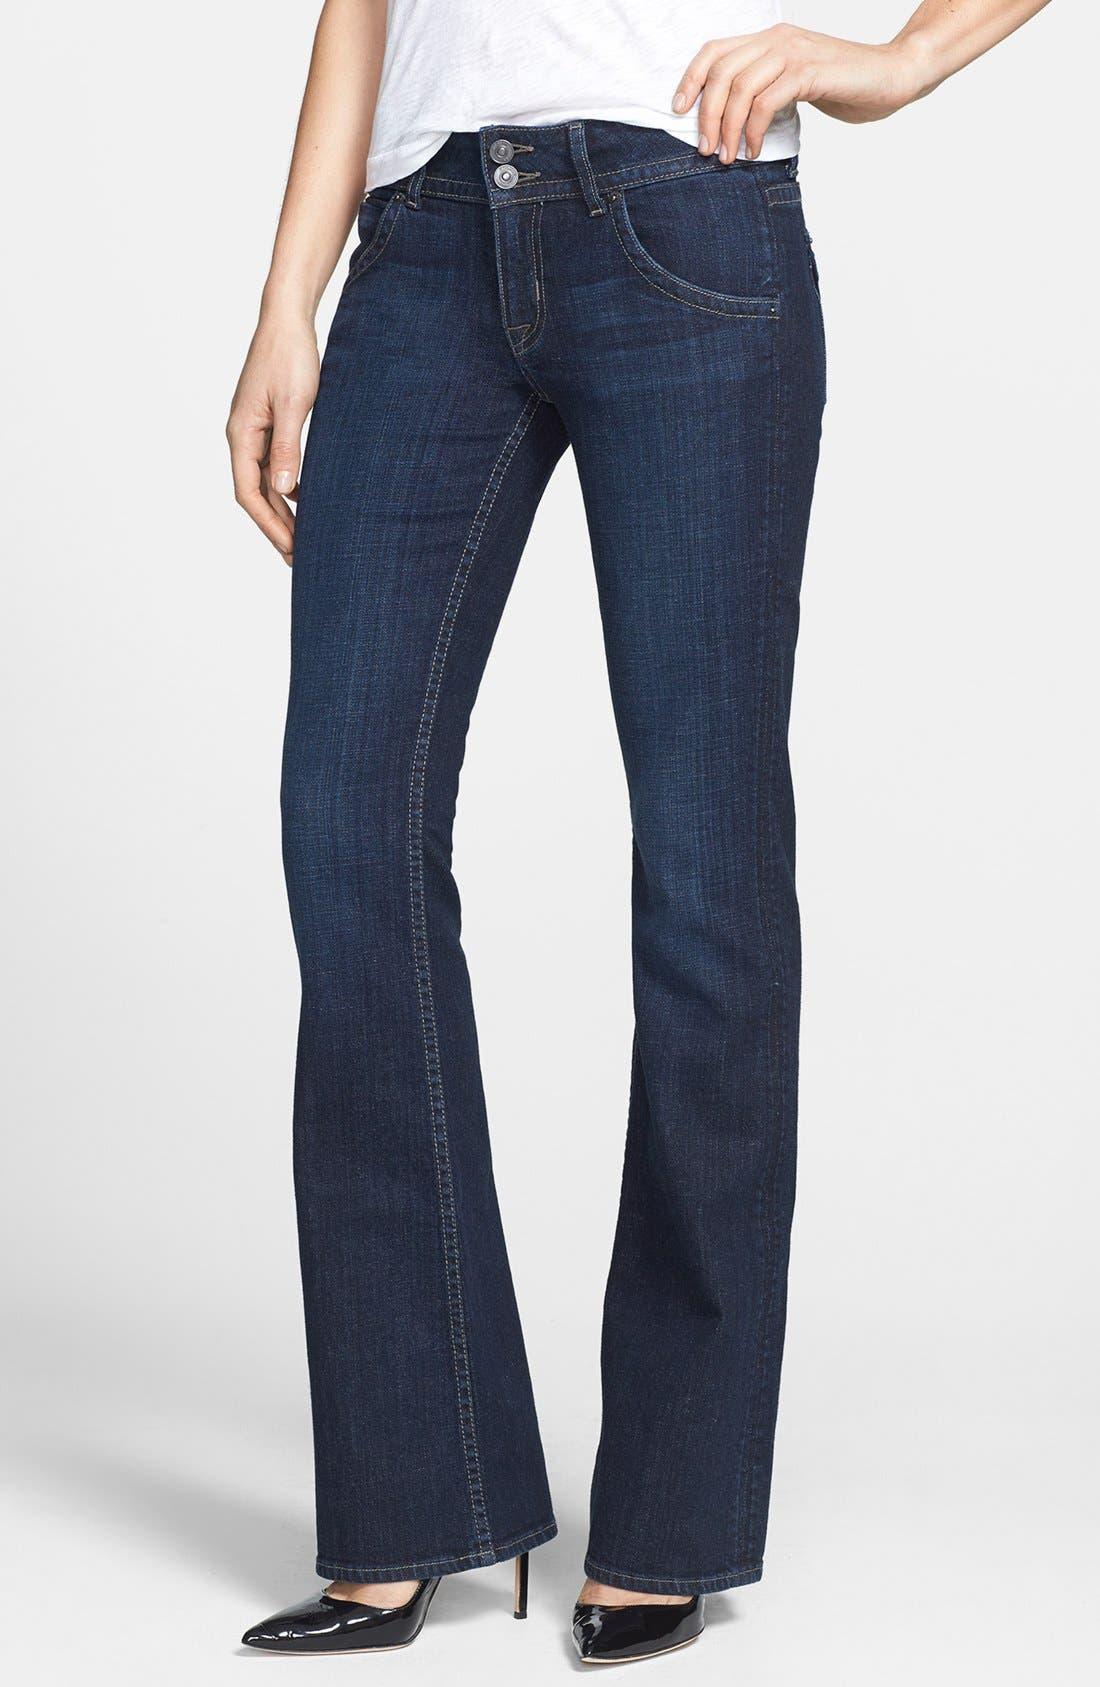 Main Image - Hudson Jeans 'Signature' Bootcut Jeans (Charisma)